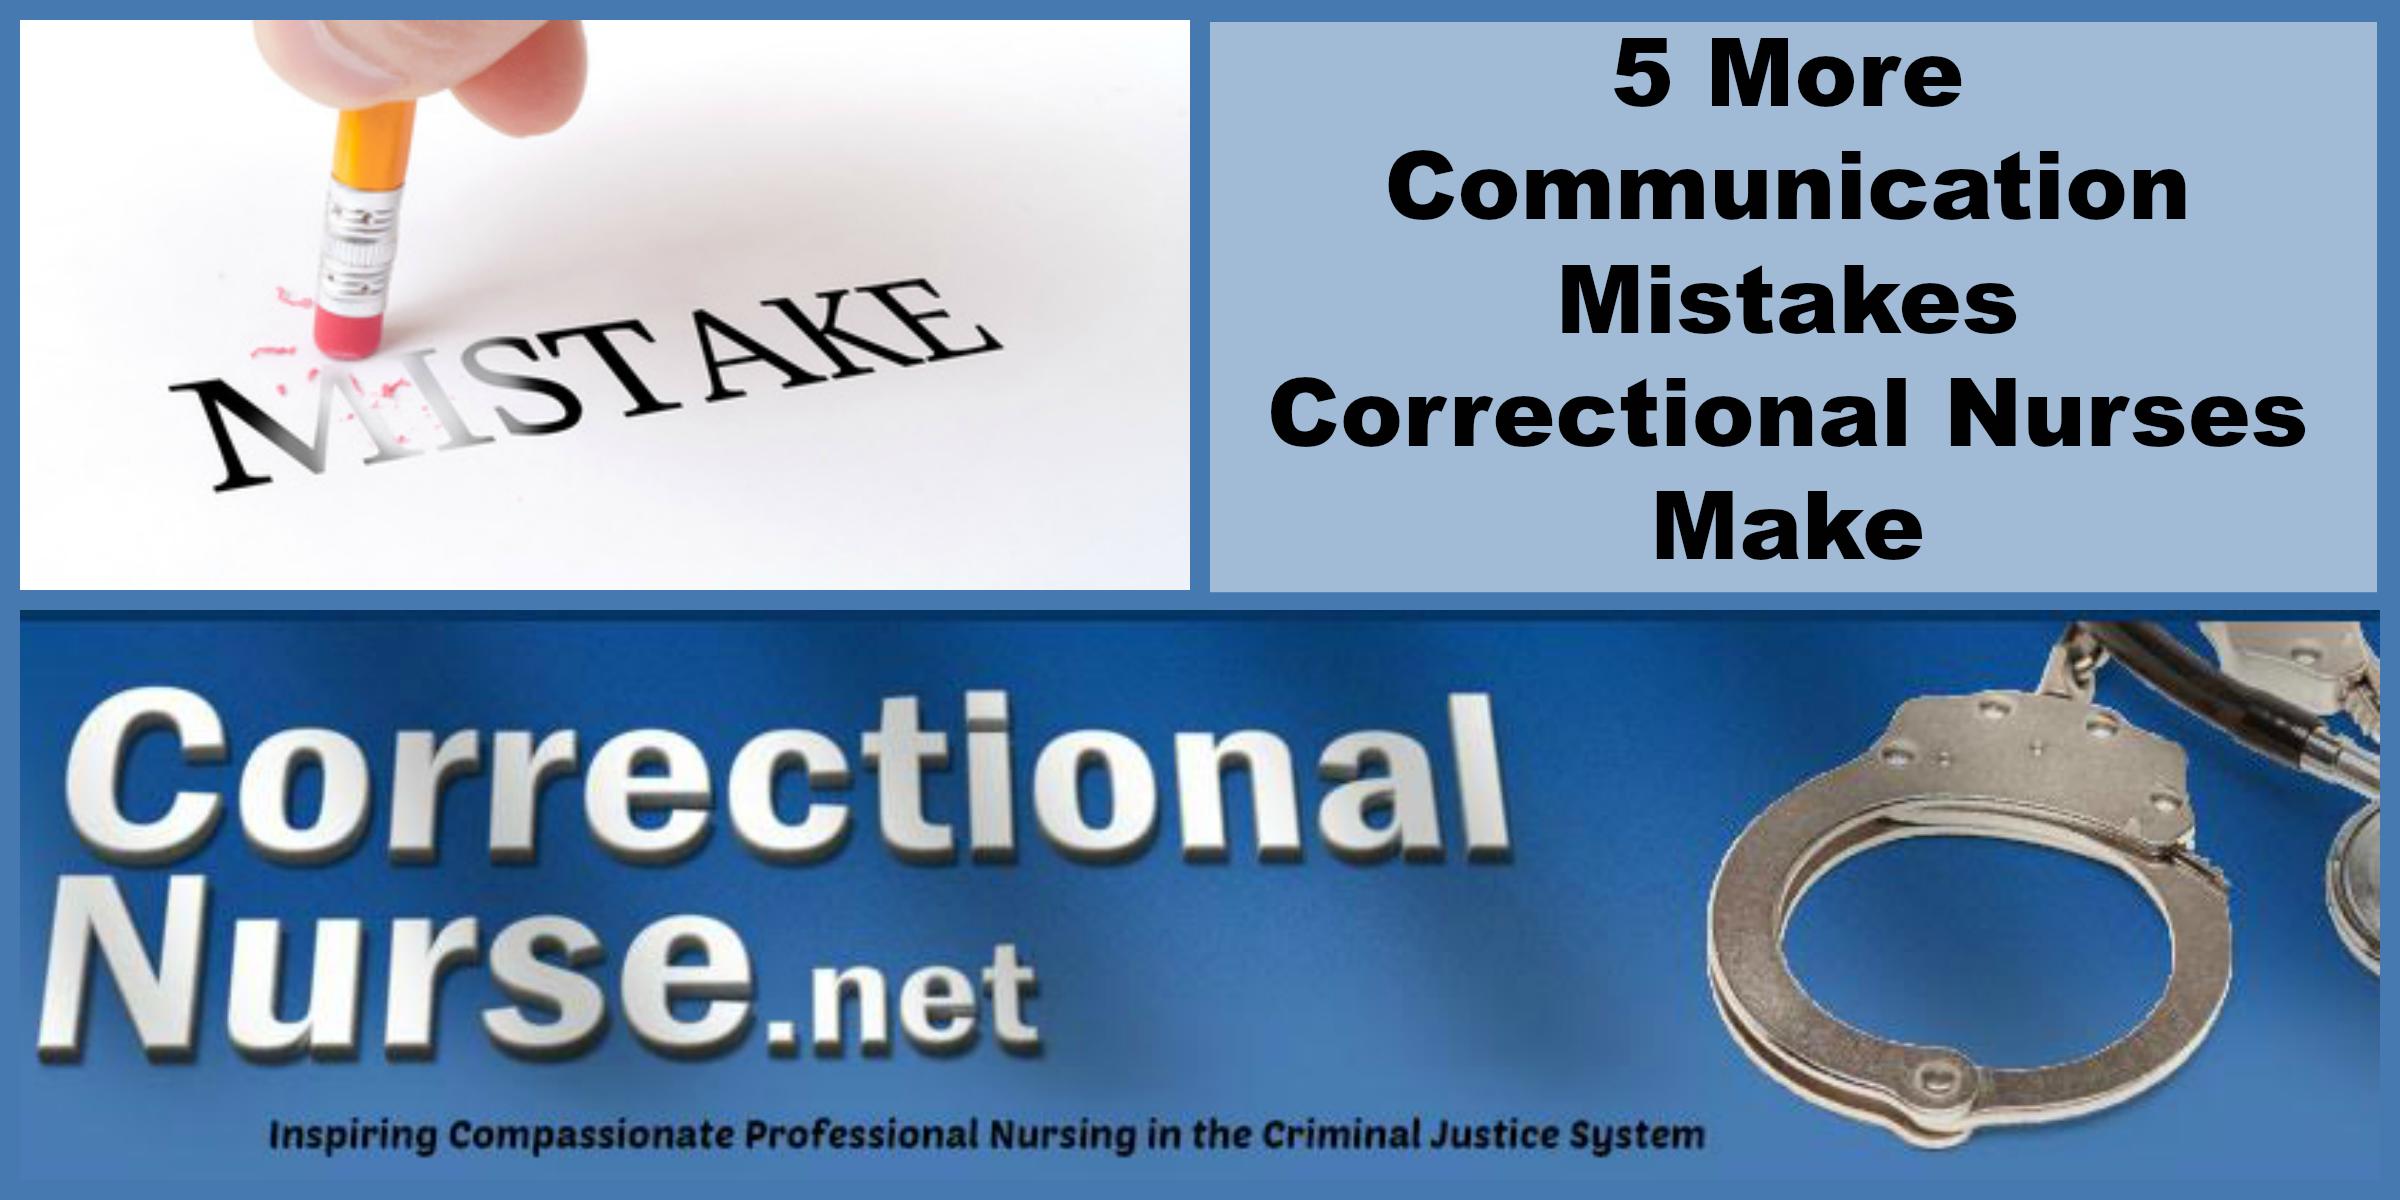 5 More Communication Mistakes Correctional Nurses Make